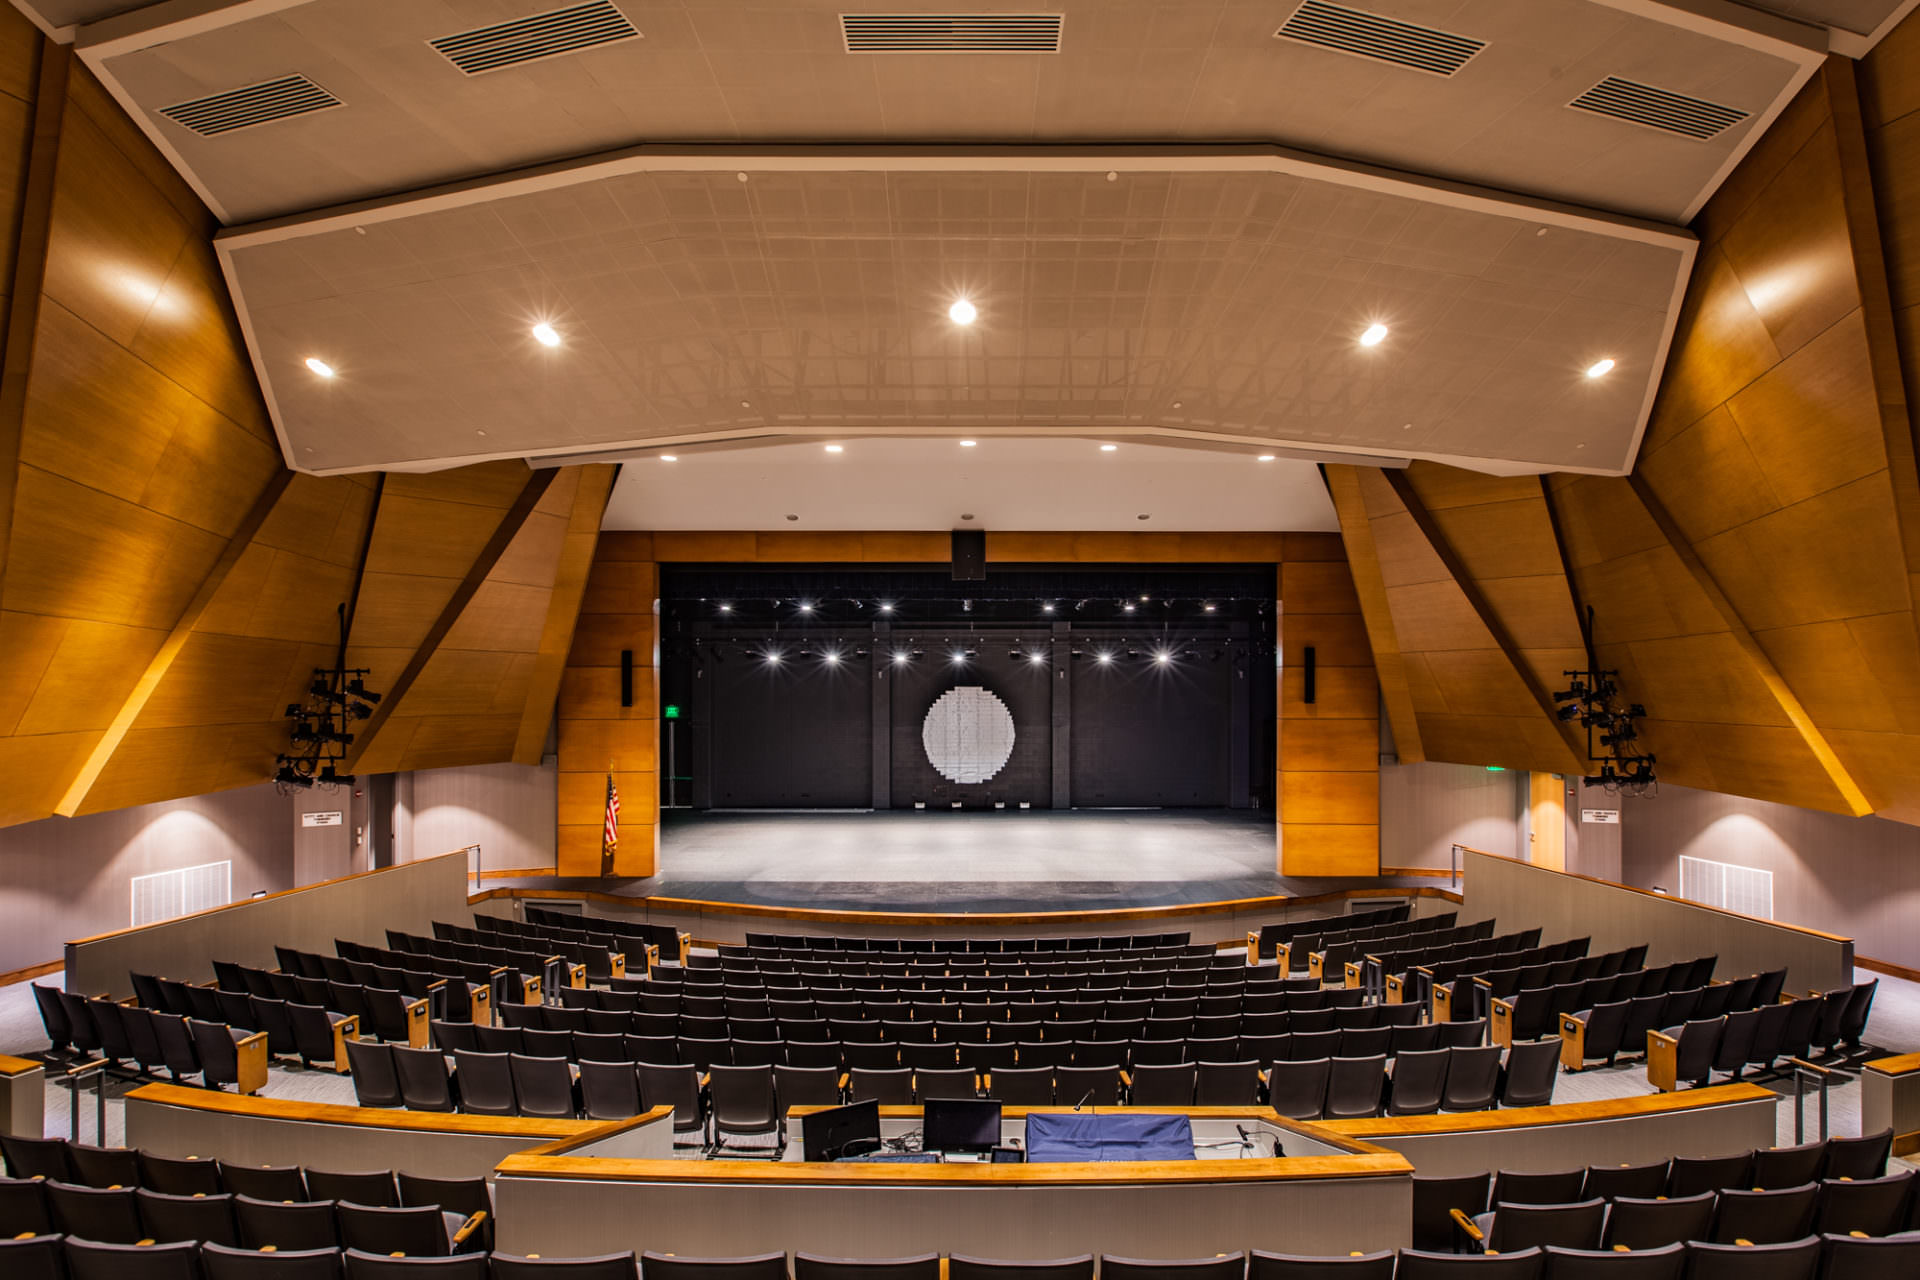 Christ Church Episcopal School Performing Arts Center